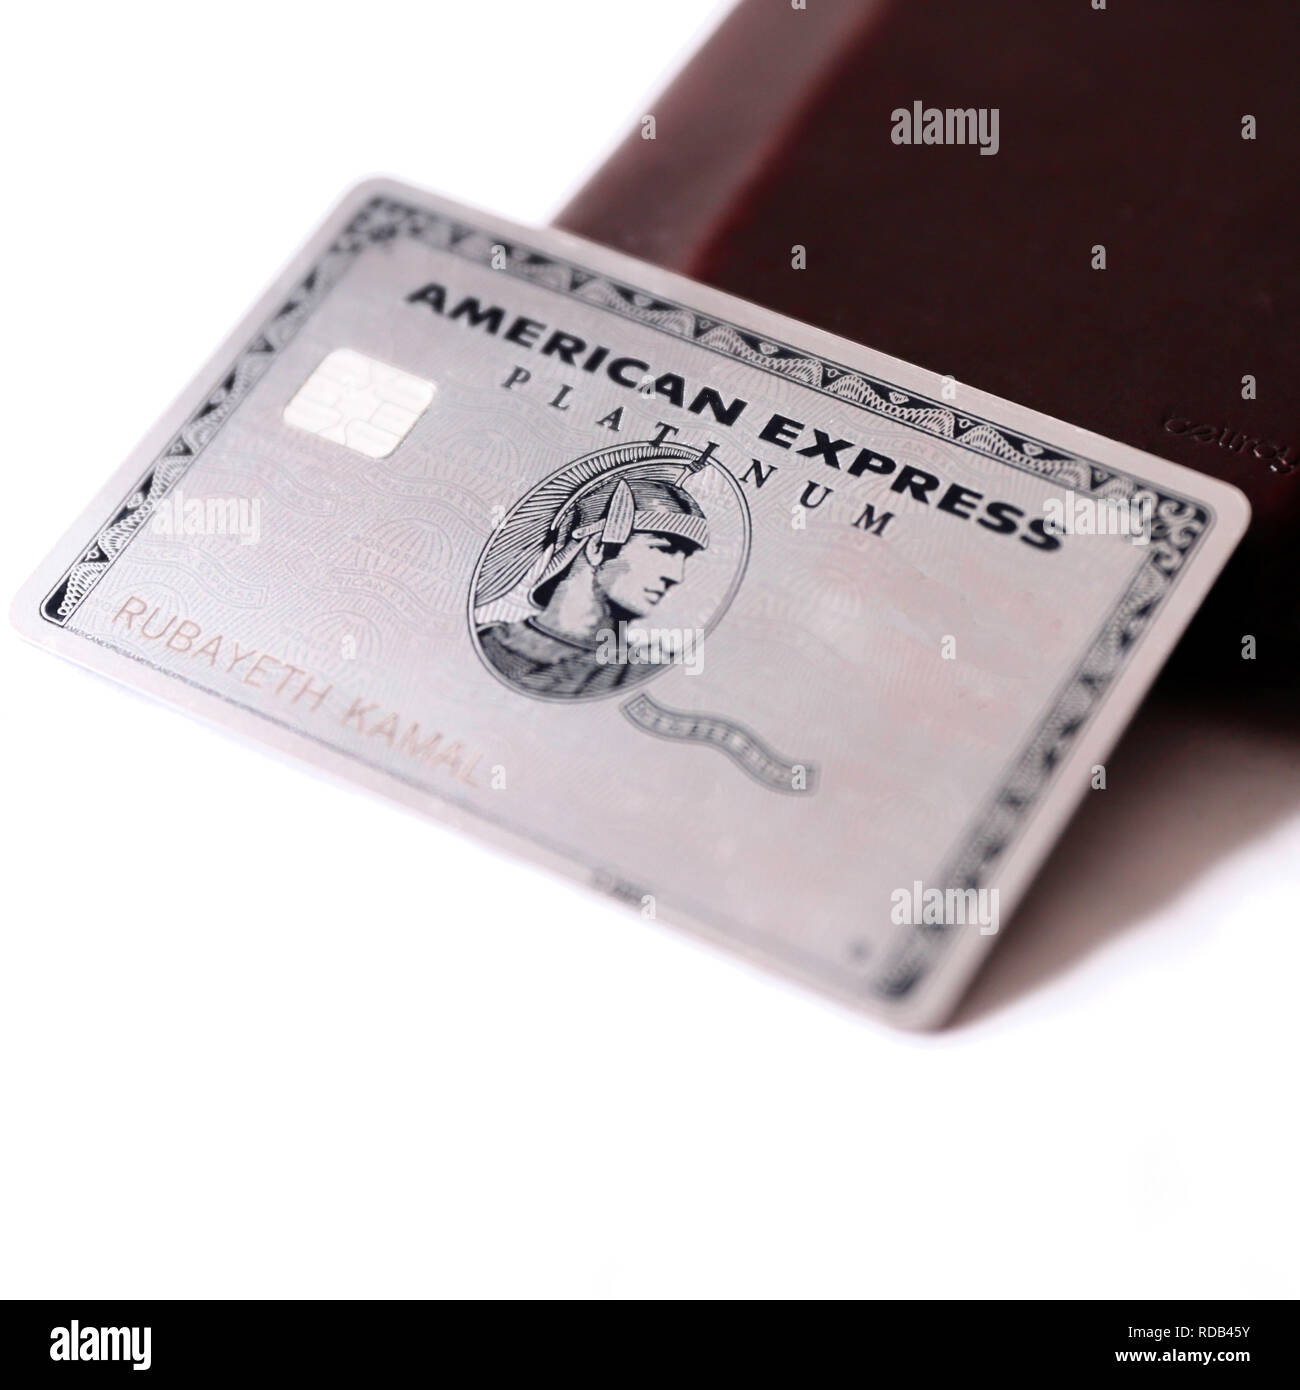 Platinum silver american express card Stock Photo: 231970087